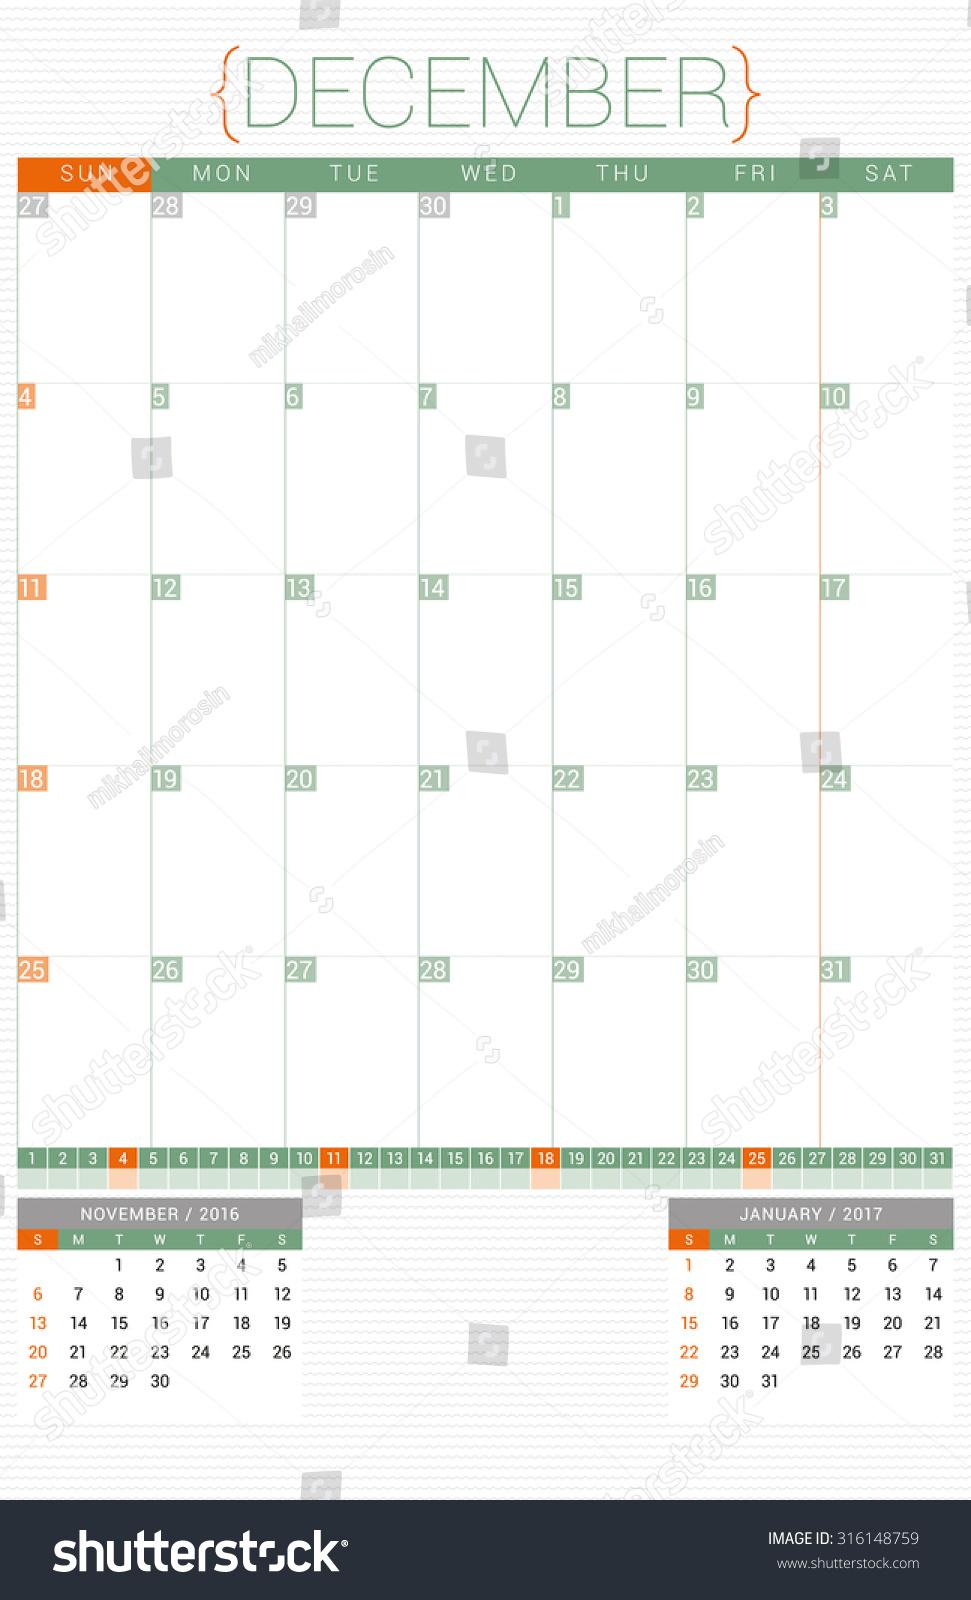 Planner Style Calendar Template : Calendar planner design template december stock